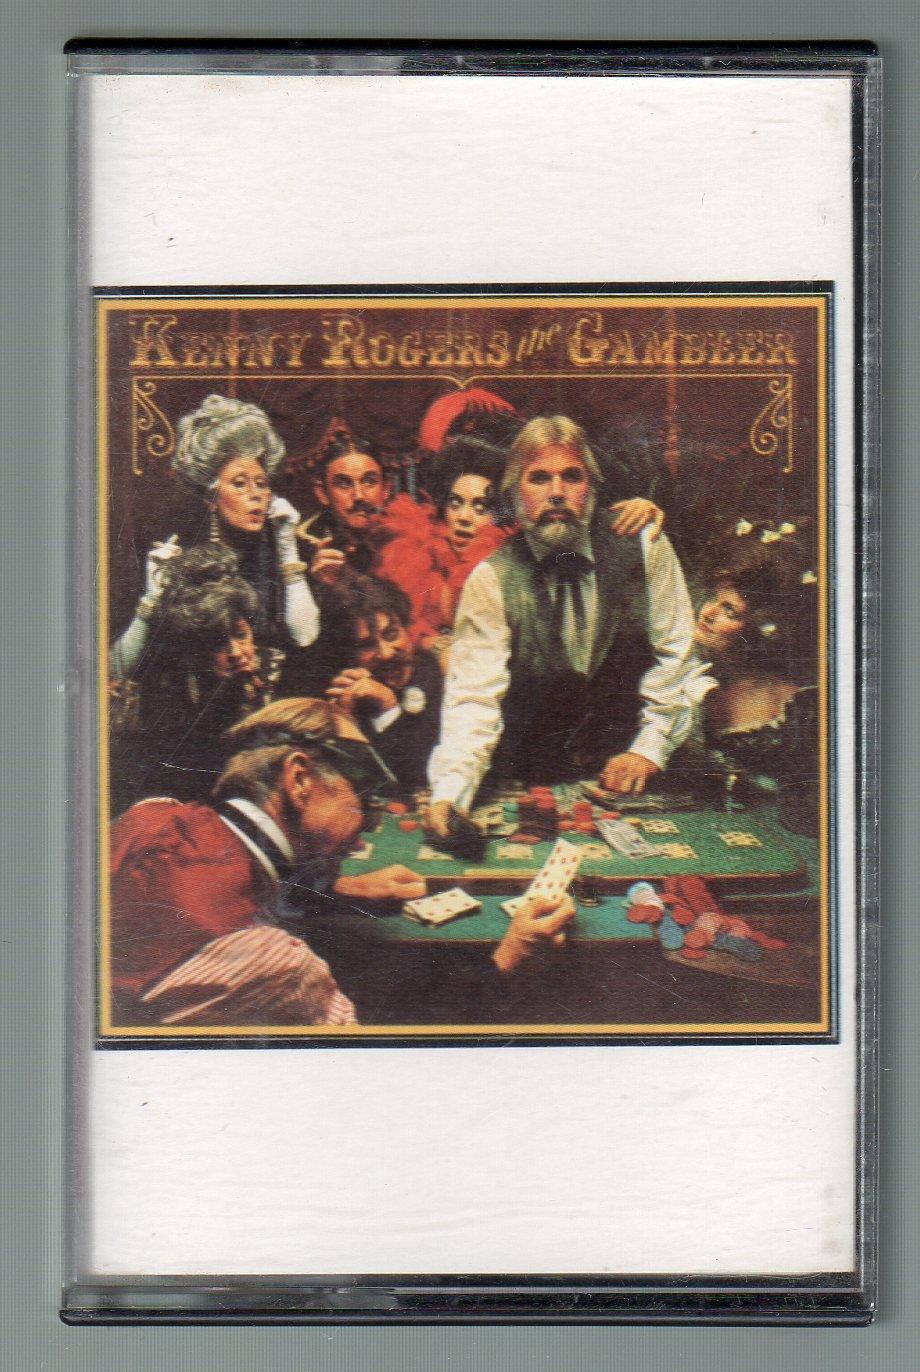 Kenny Rogers - The Gambler Cassette Tape